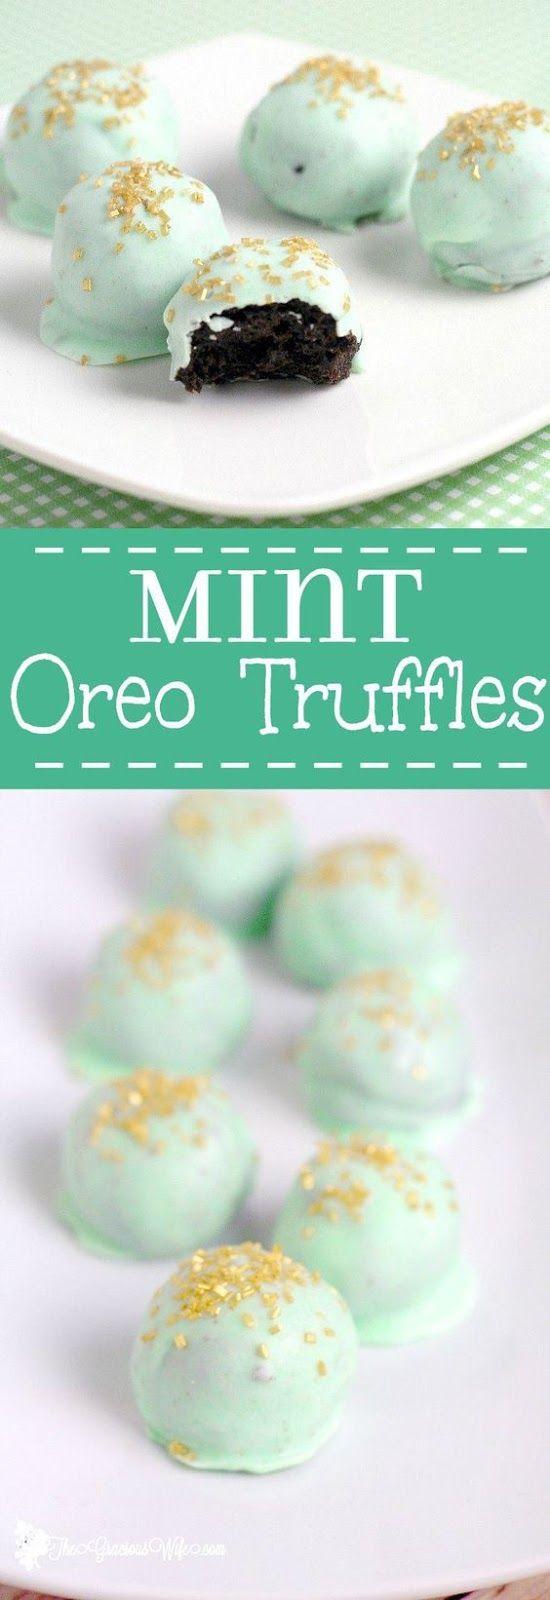 Mint Oreo Truffles Recipe - an easy mint chocolate dessert recipe idea